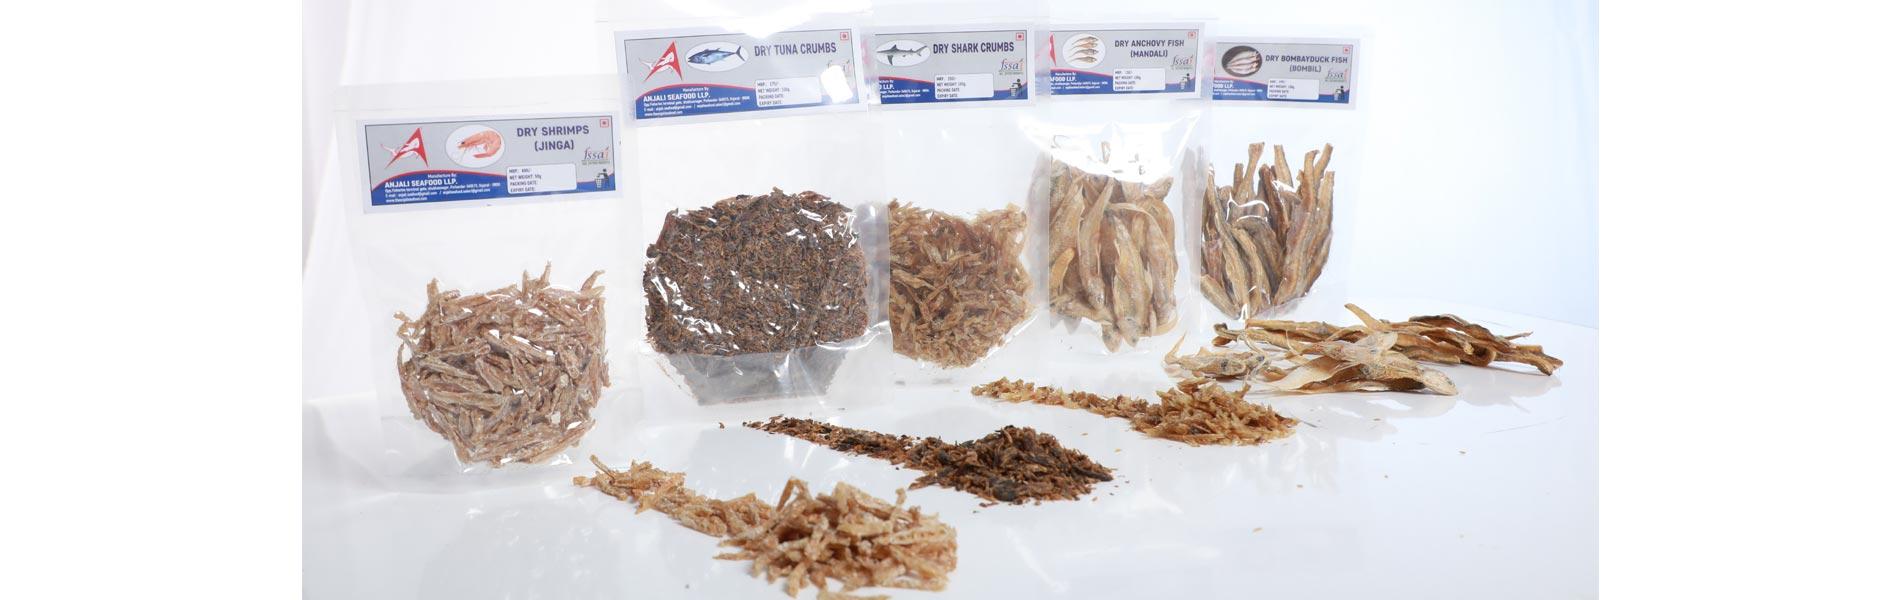 Anjali seafood LLP.